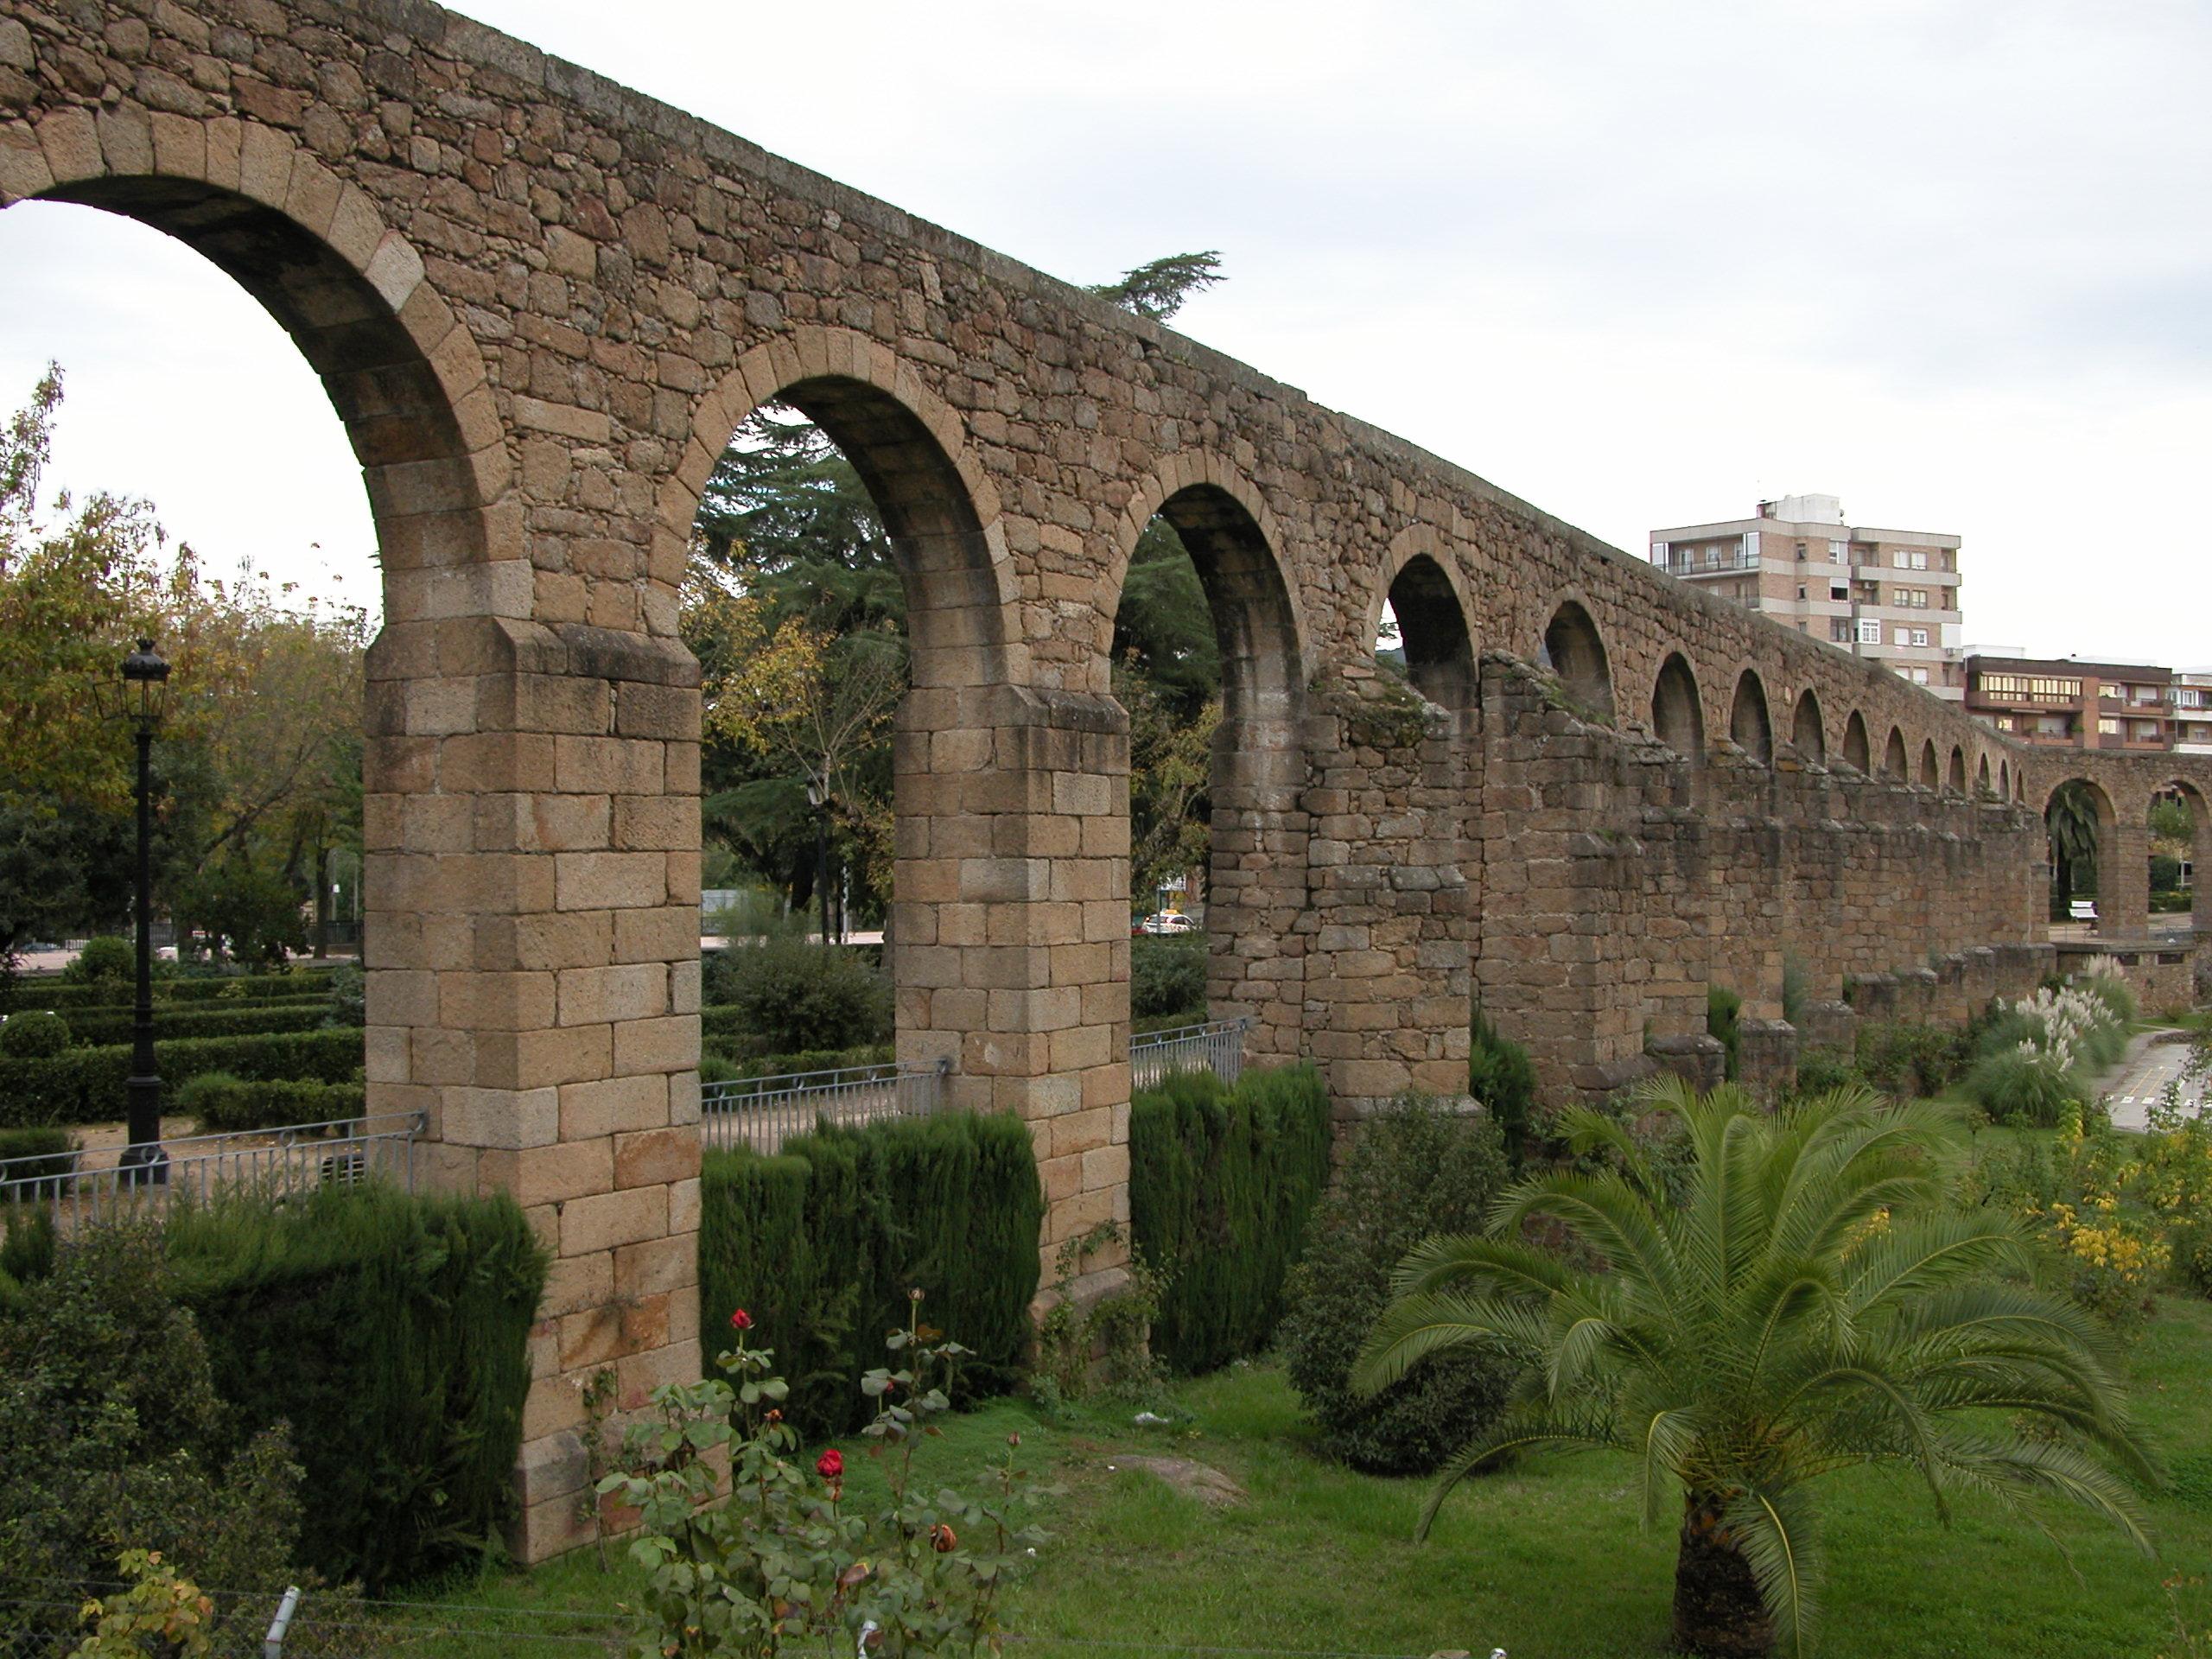 File:Acueducto plasencia.JPG - Wikimedia Commons